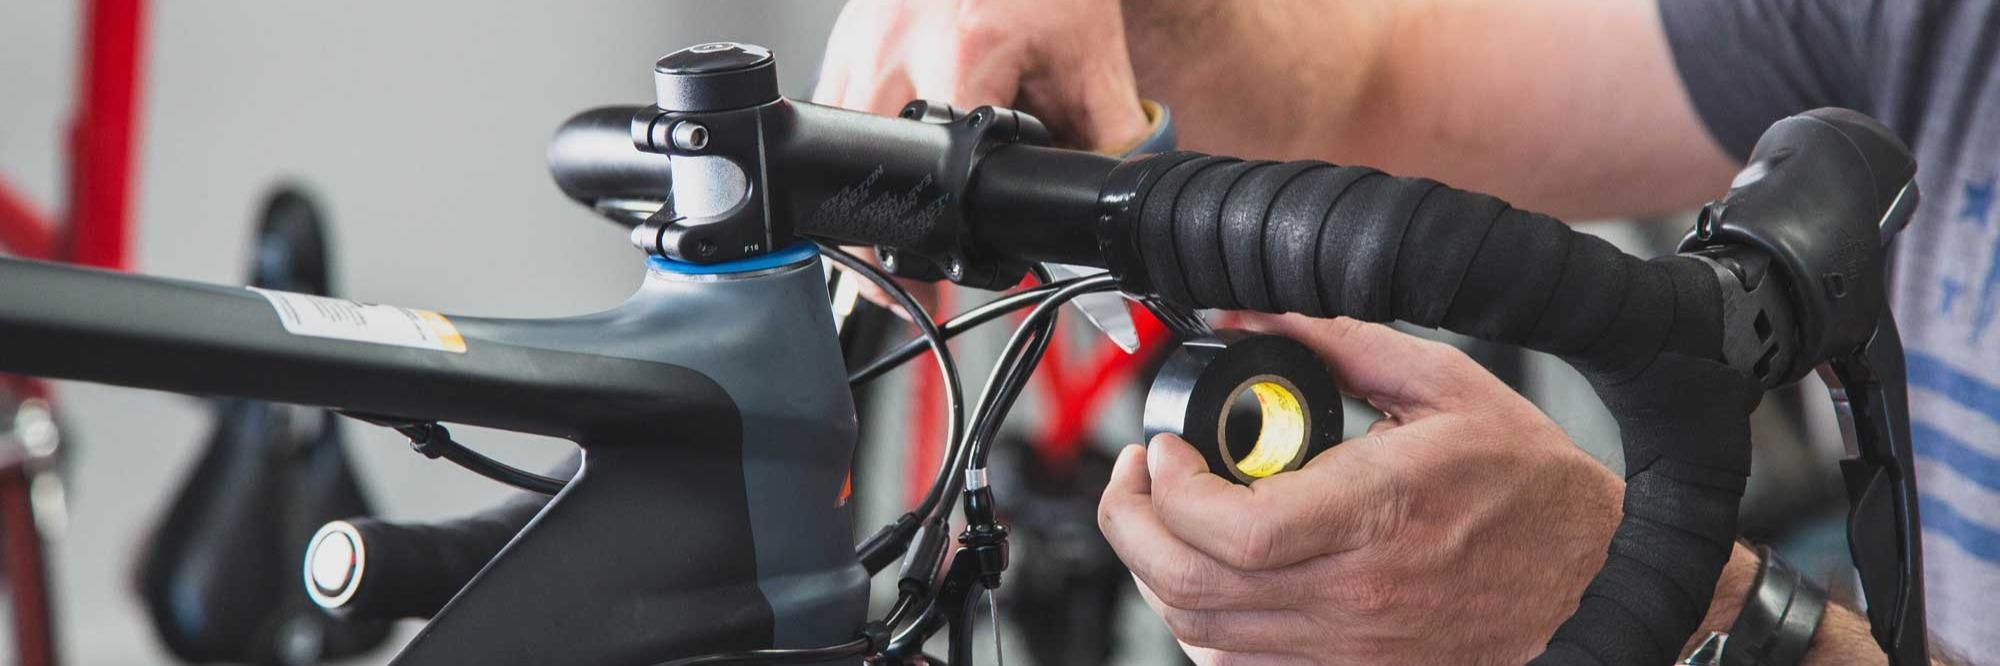 Jax Bicycle Center- best bike repair shop in Southern, CA